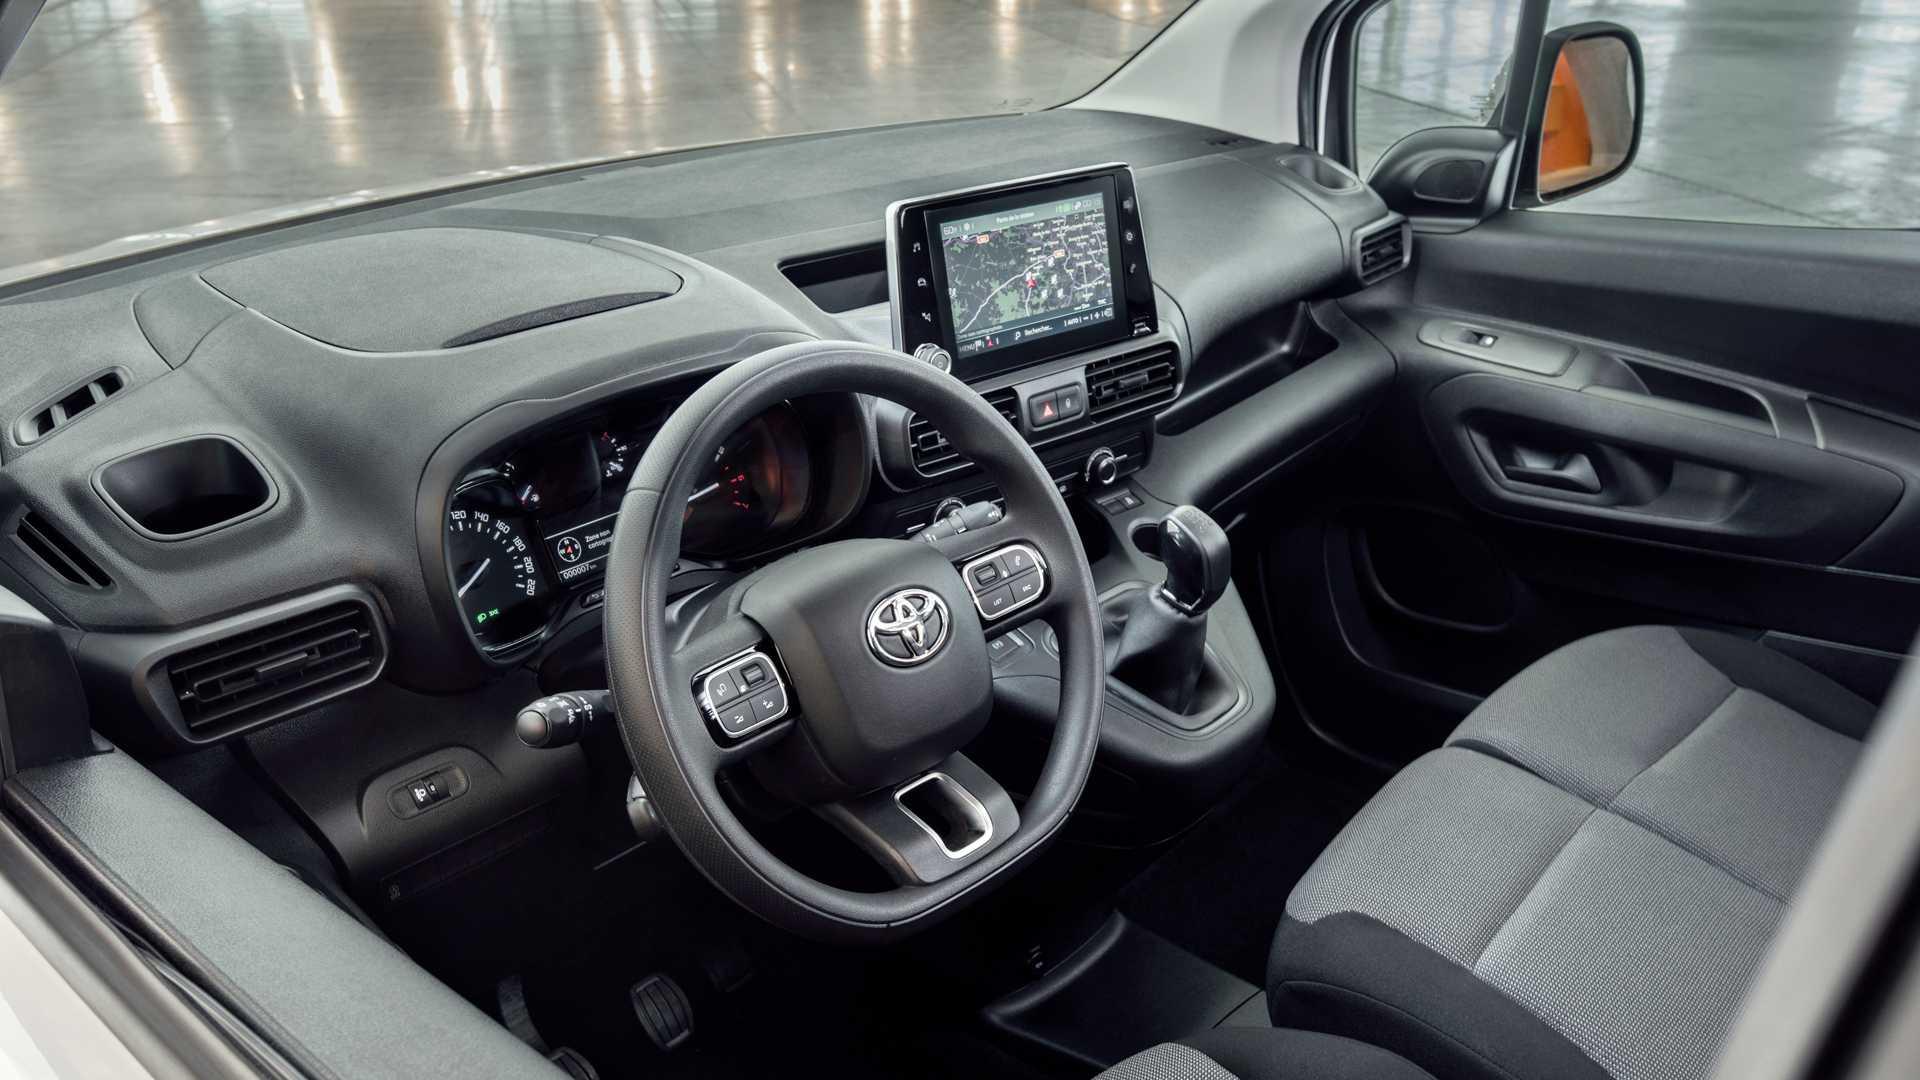 Toyota Nin Yeni Ticarisi Karsinizda Proace City Otodunya